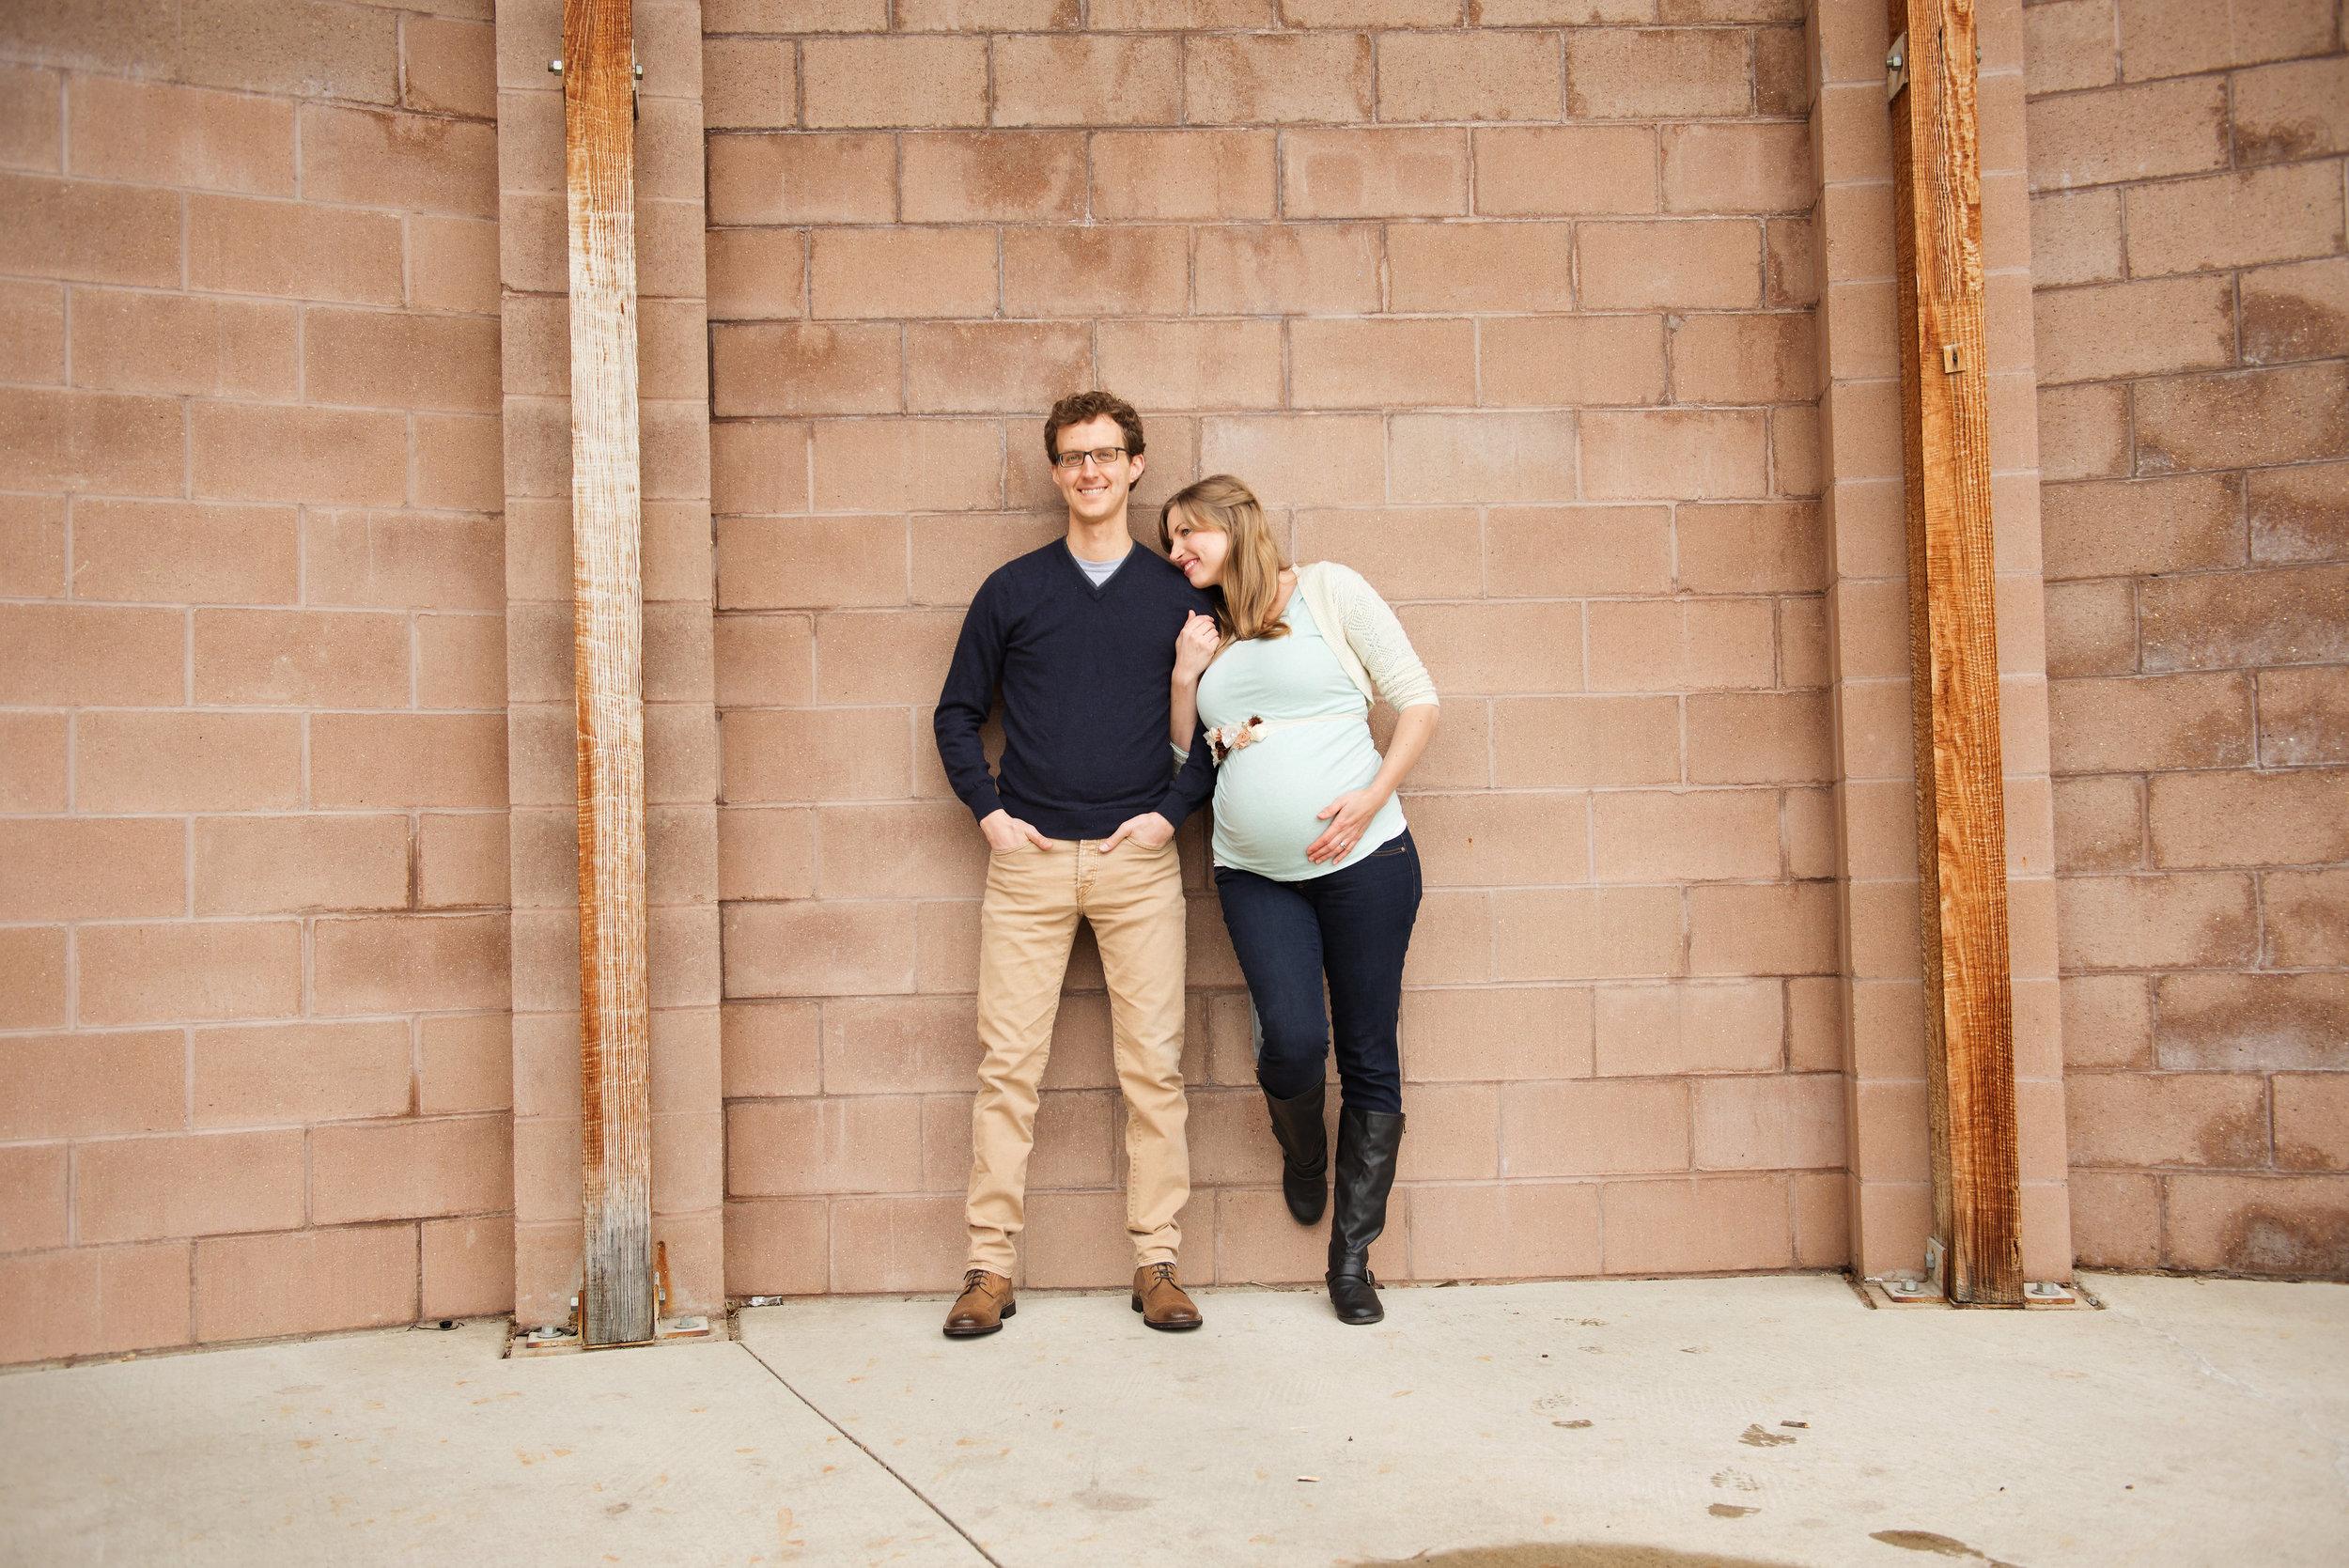 Orlando-couple-maternity.jpg